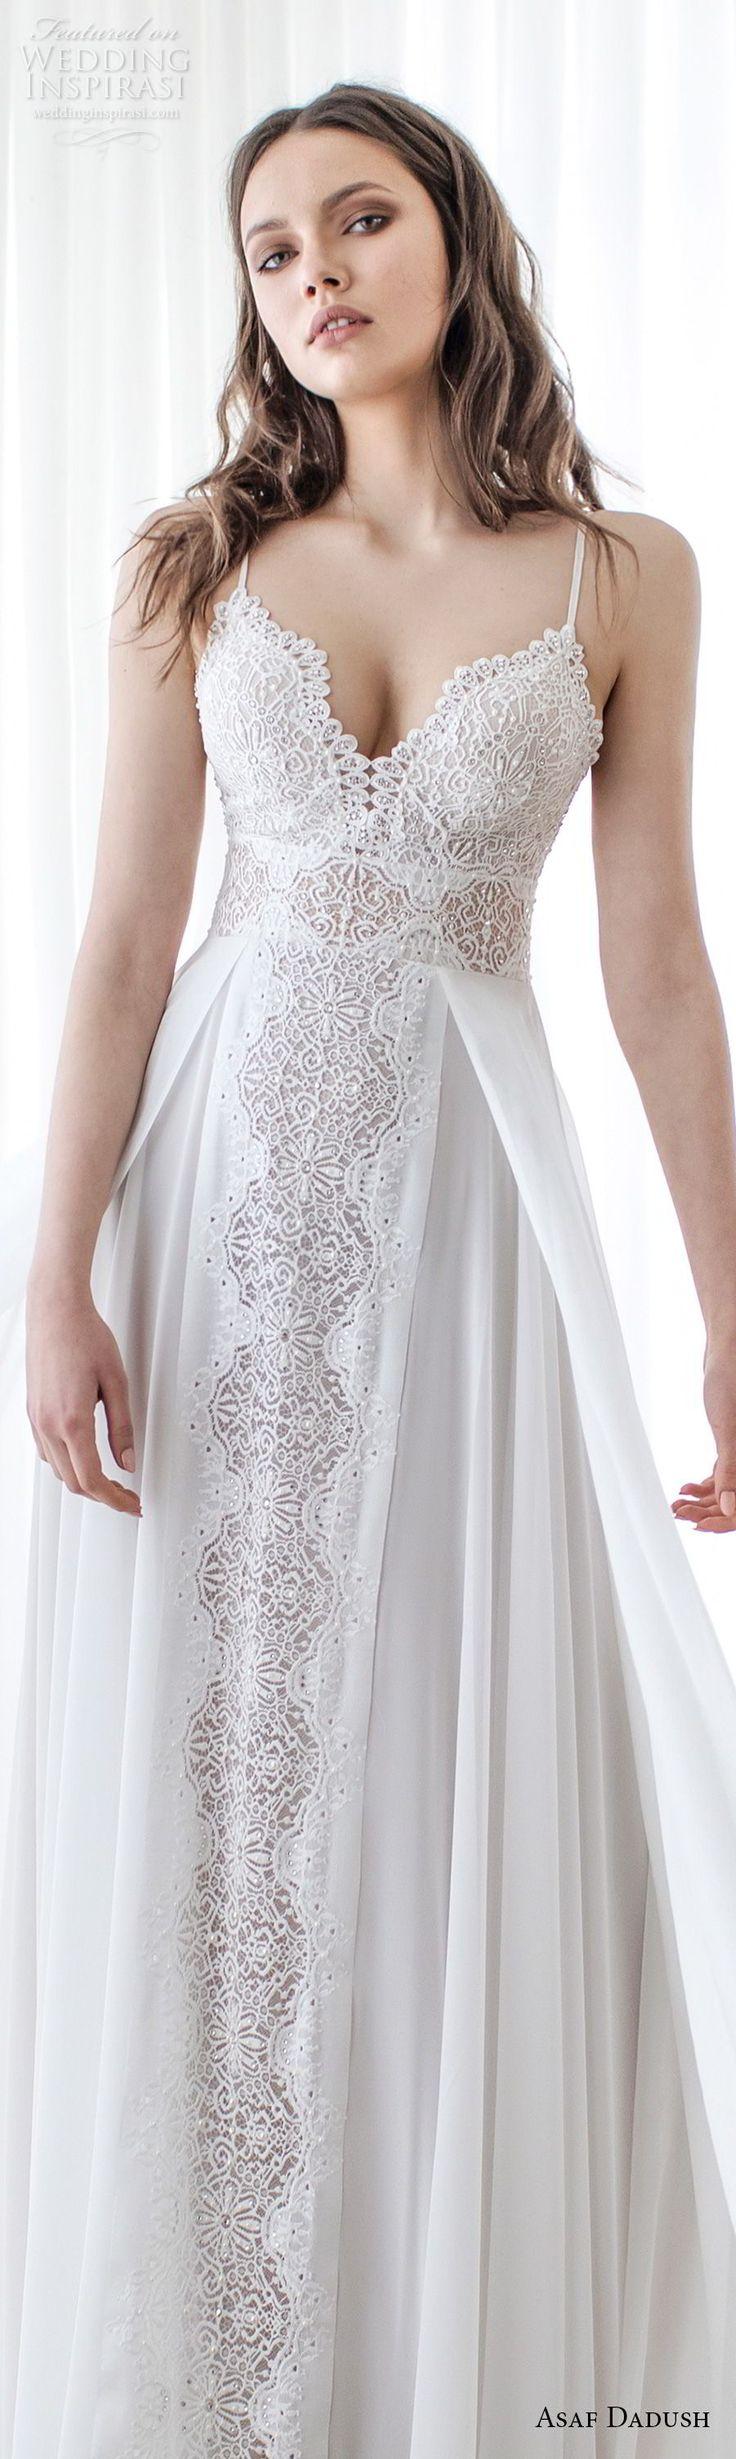 asaf dadush 2017 bridal sleeveless spaghetti strap sweetheart neckline heavily embellished bodice elegant romantic soft a  line wedding dress sweep train (07) lv